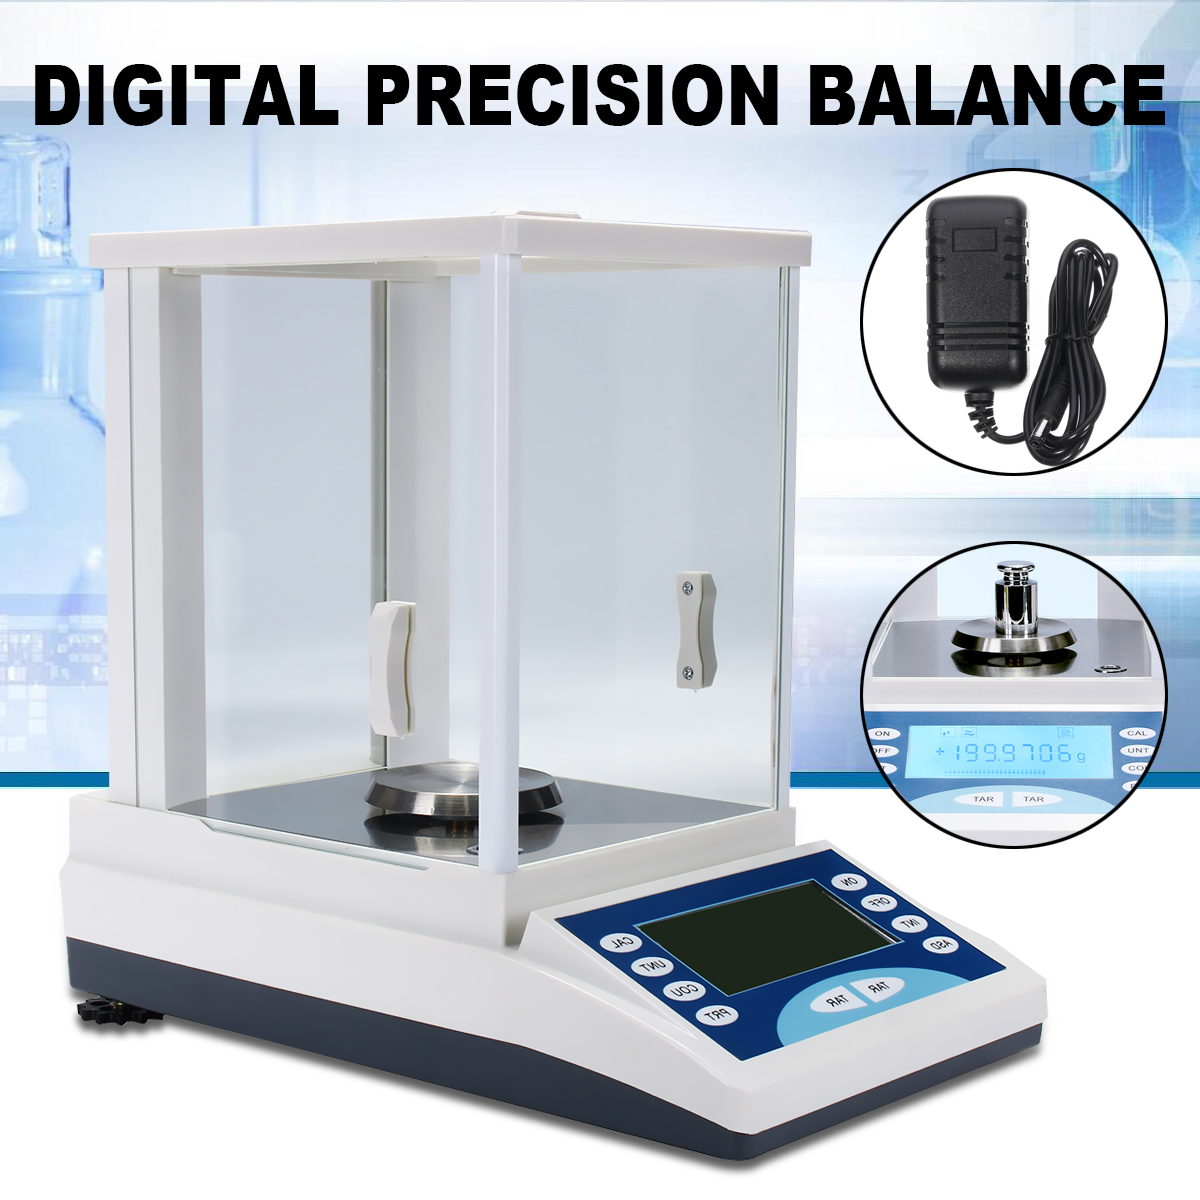 Digital Precision Scale Lab Analytical Balance 200 / 0.0001g 0.1mg 100-240V Top Quality Electronic Balance Aluminum Alloy Base hc b20001 electronic analytical balance digital balance lab balance 2kg range 0 1g resolution